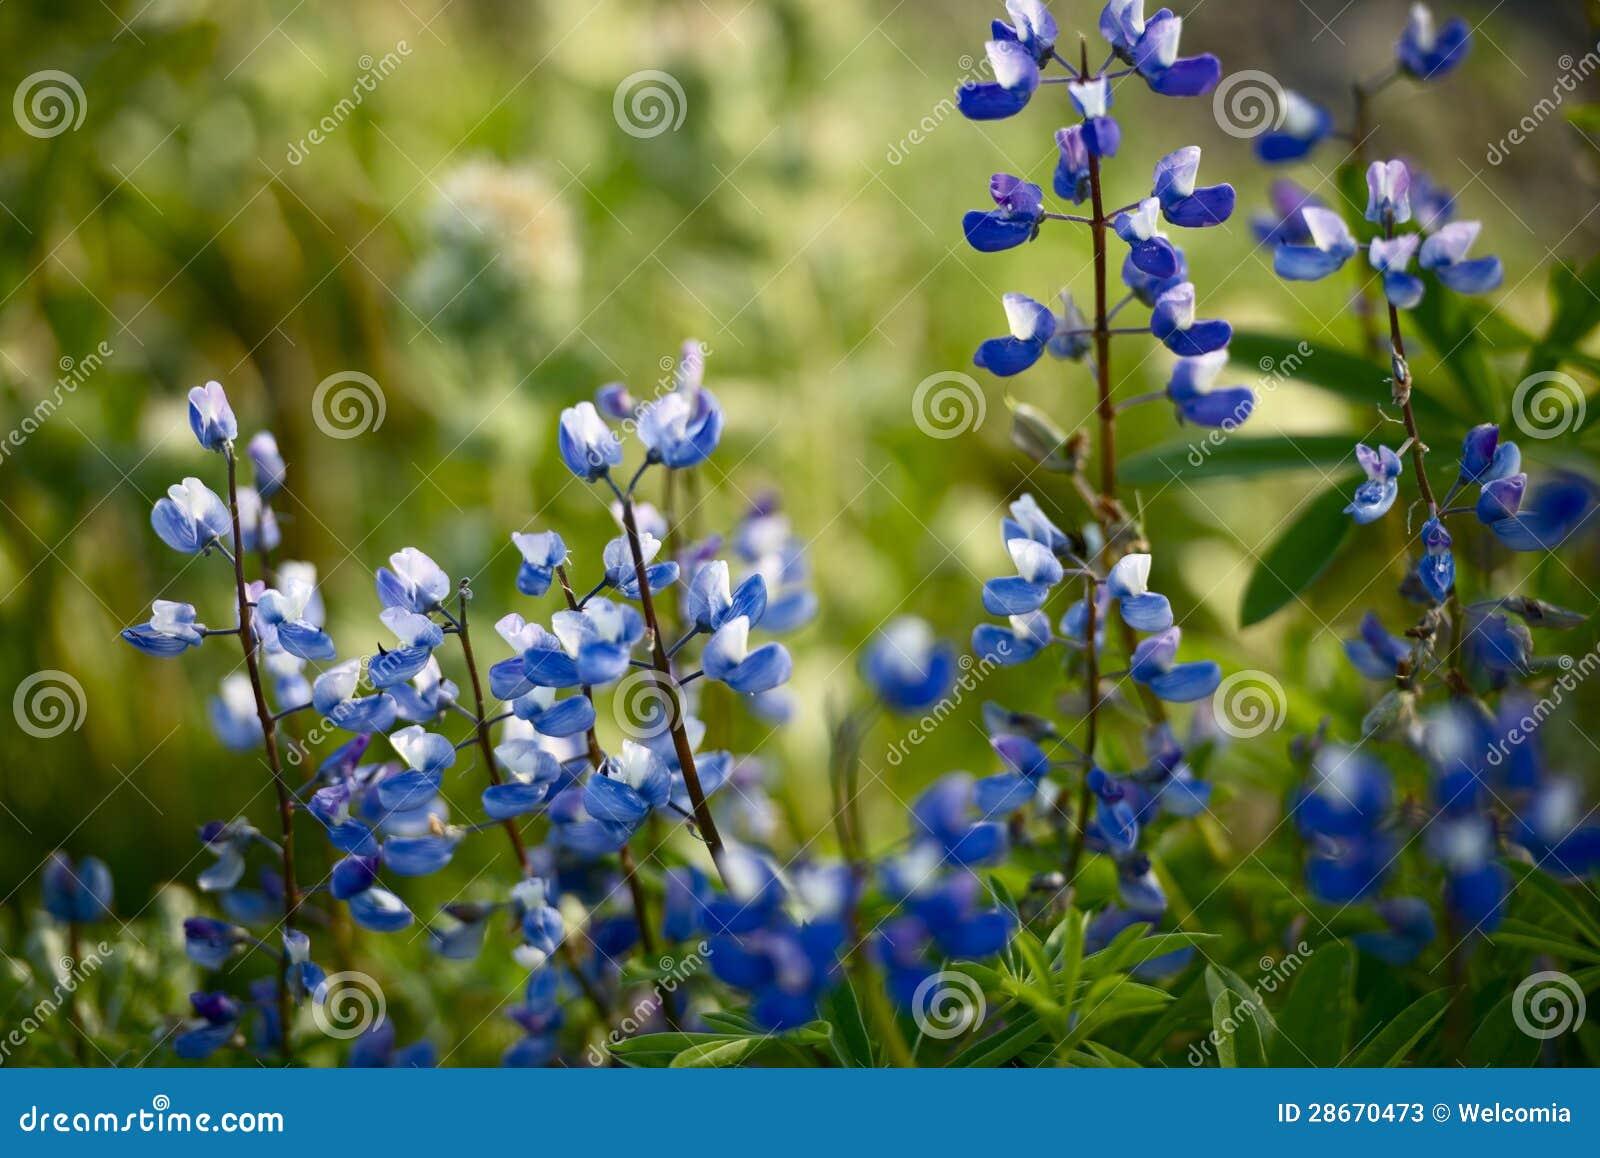 Wildflowers: Lupine azul